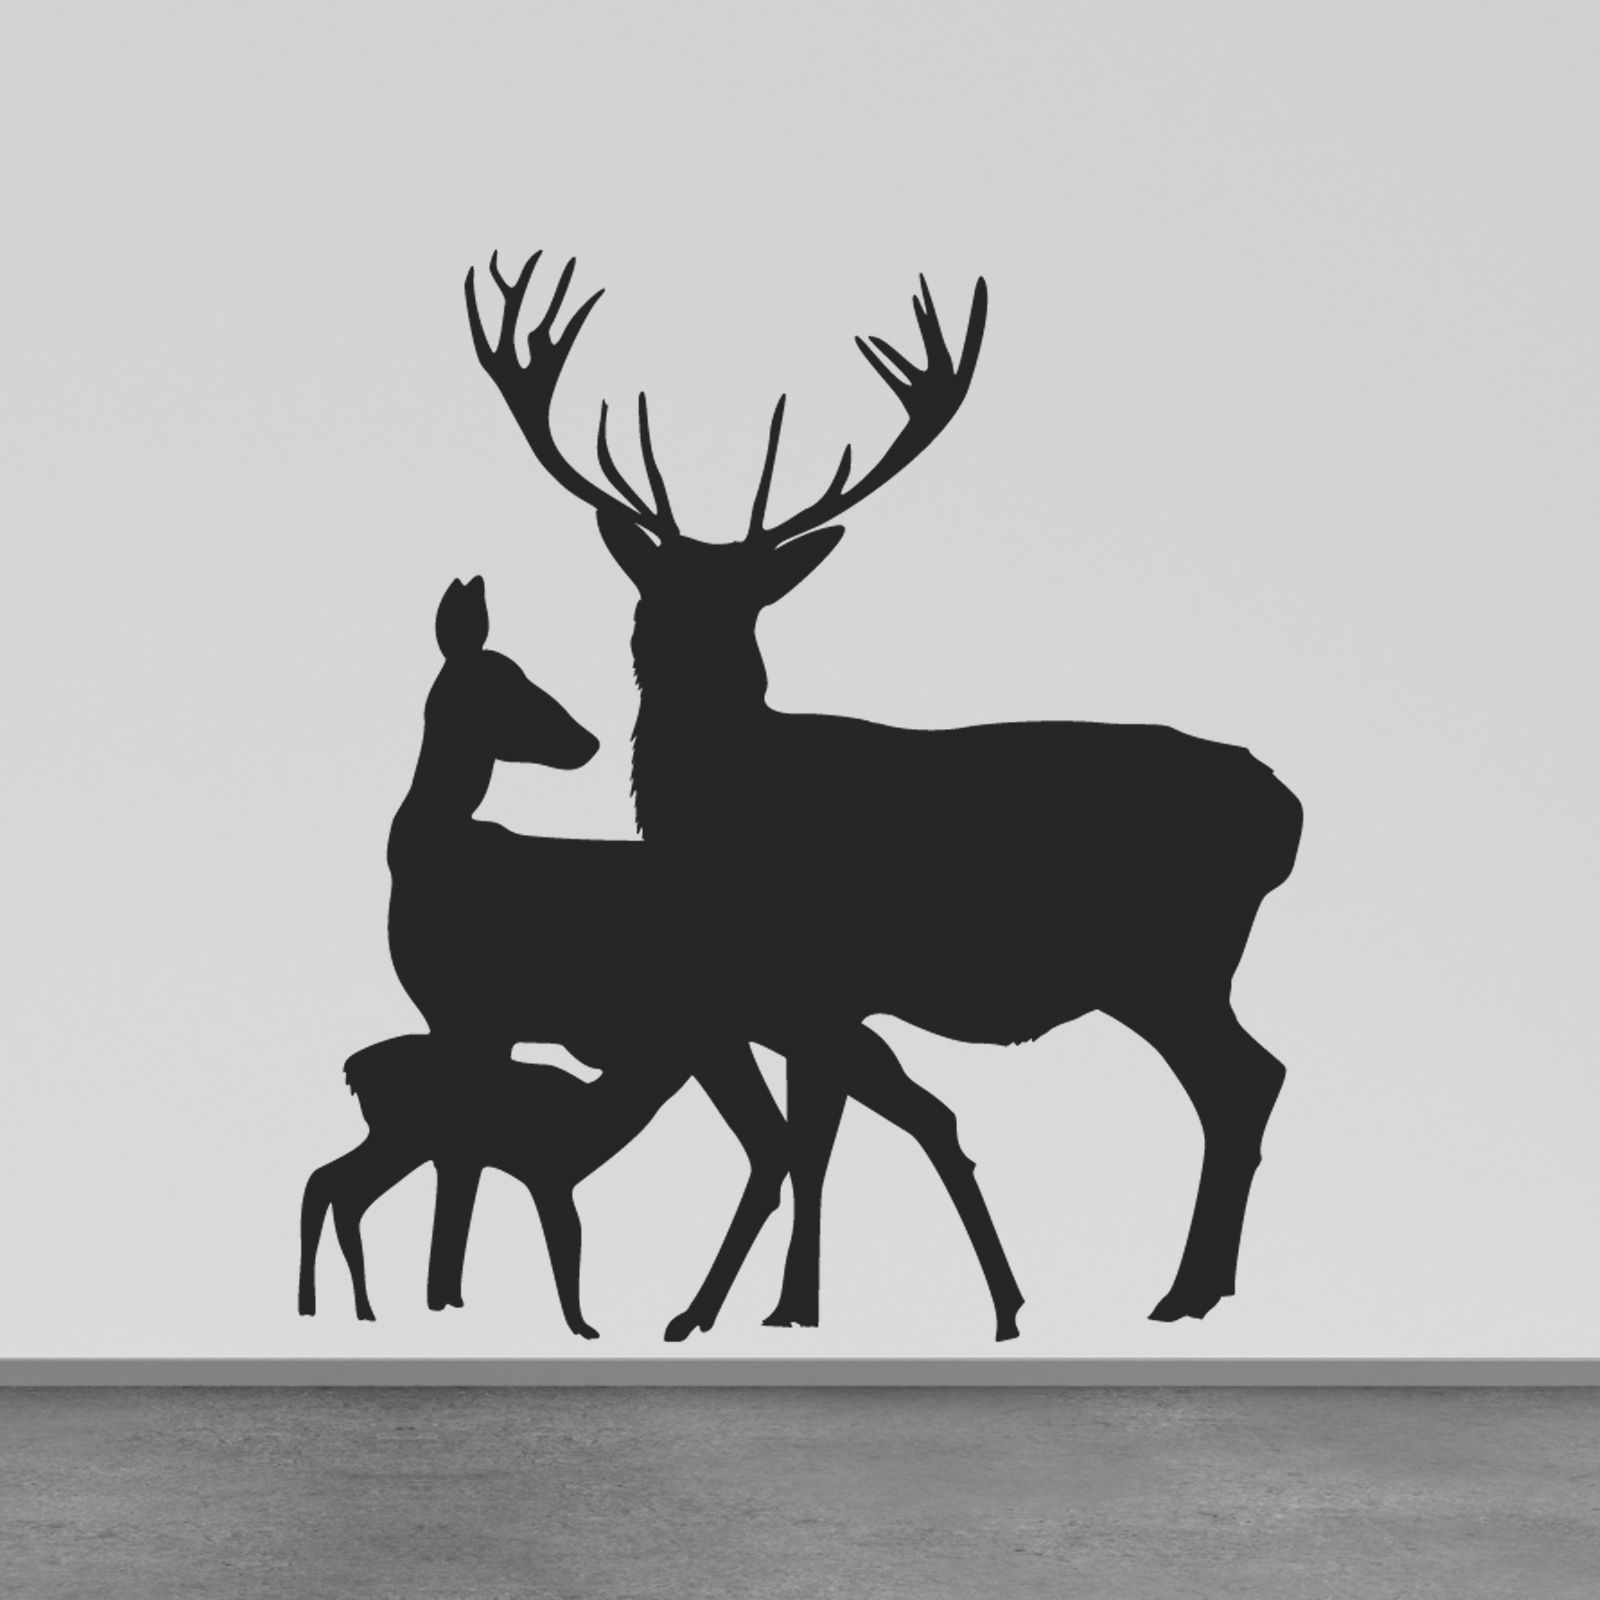 Deer Wall Decals Family Decal Art